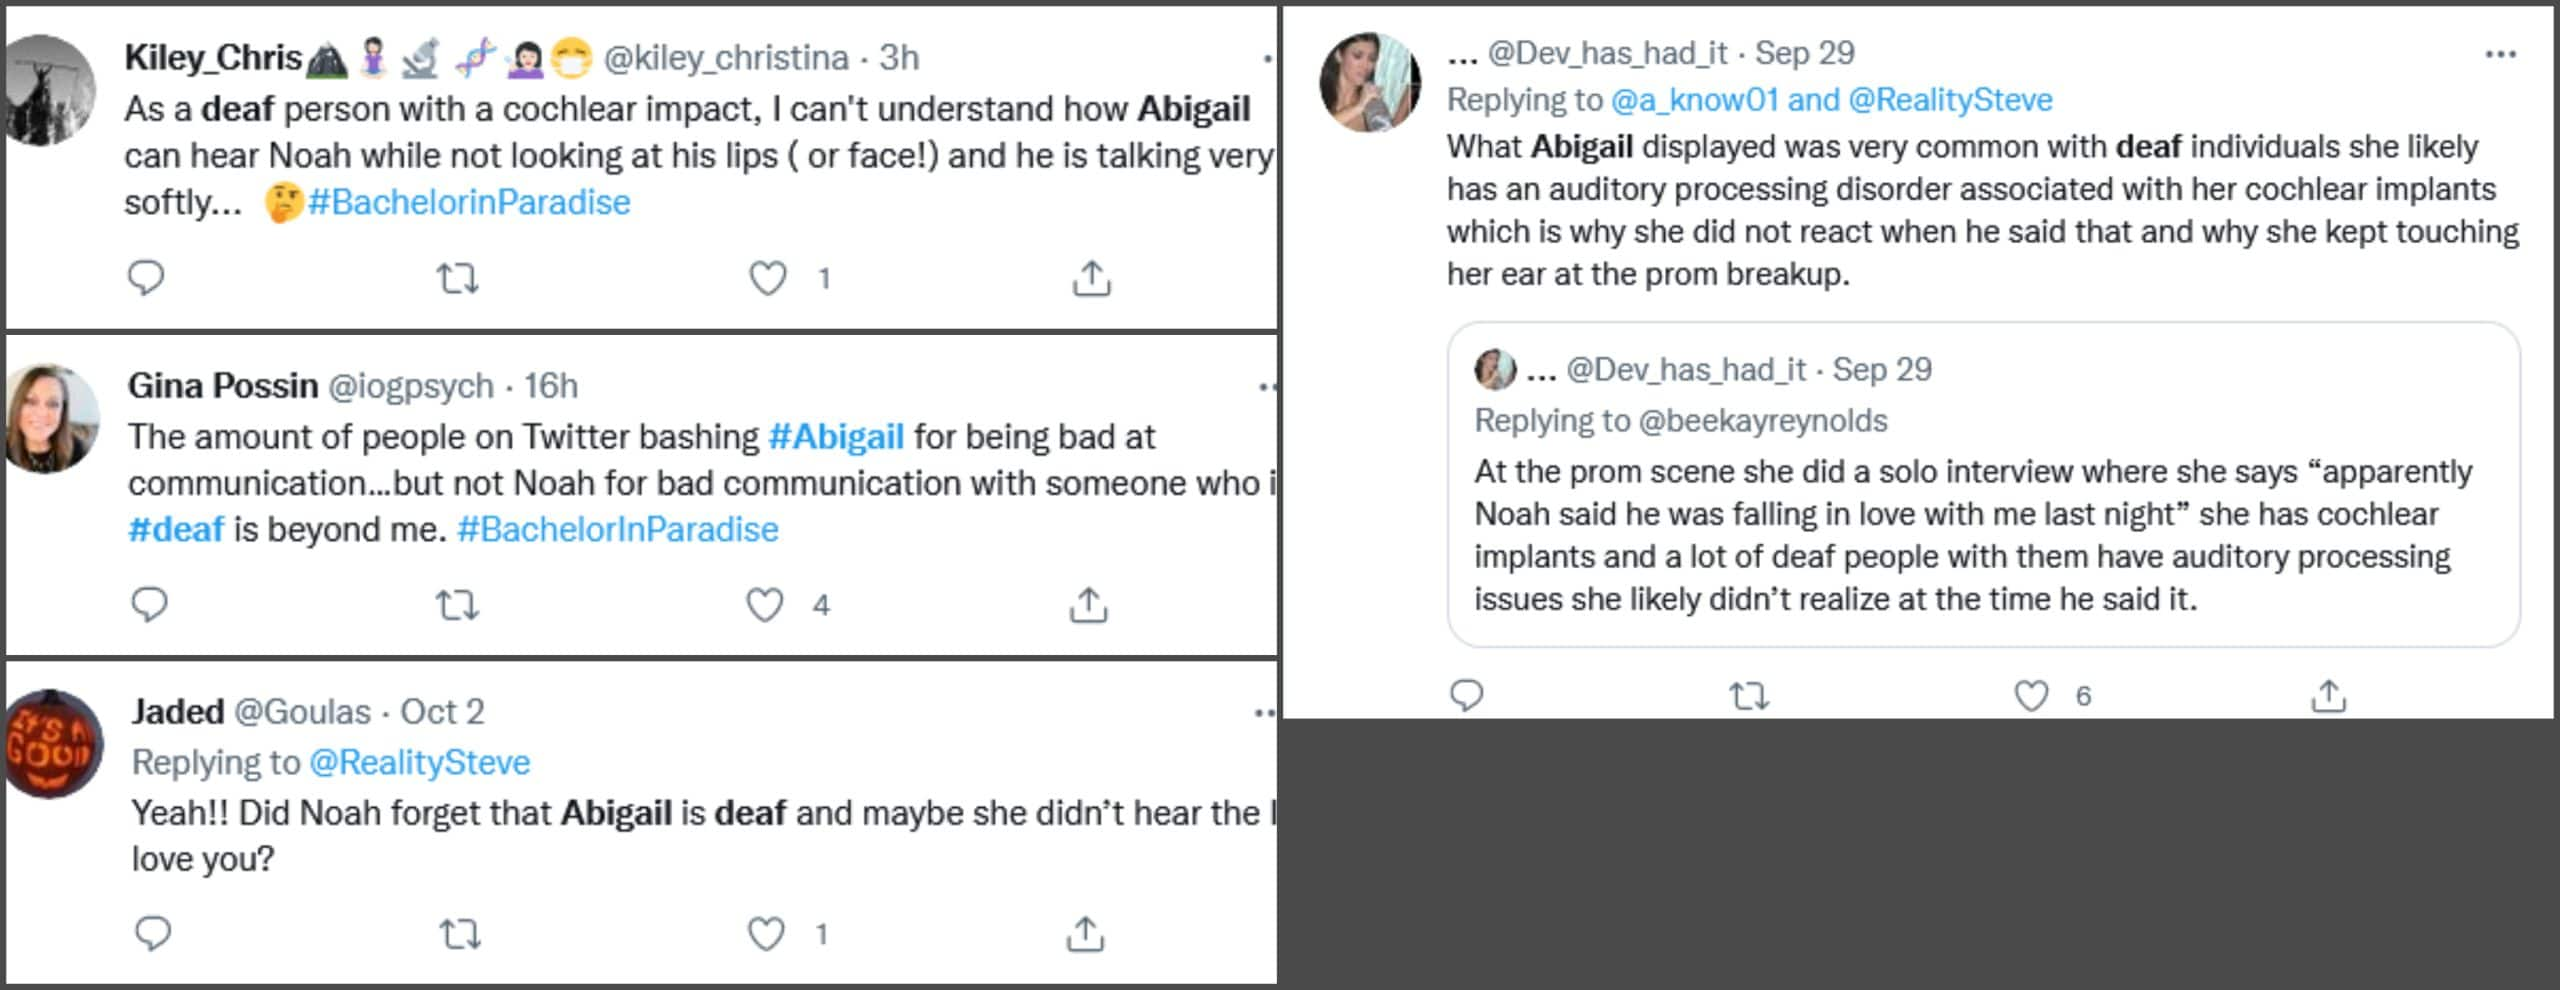 Comments about Abigail Heringer via Twitter